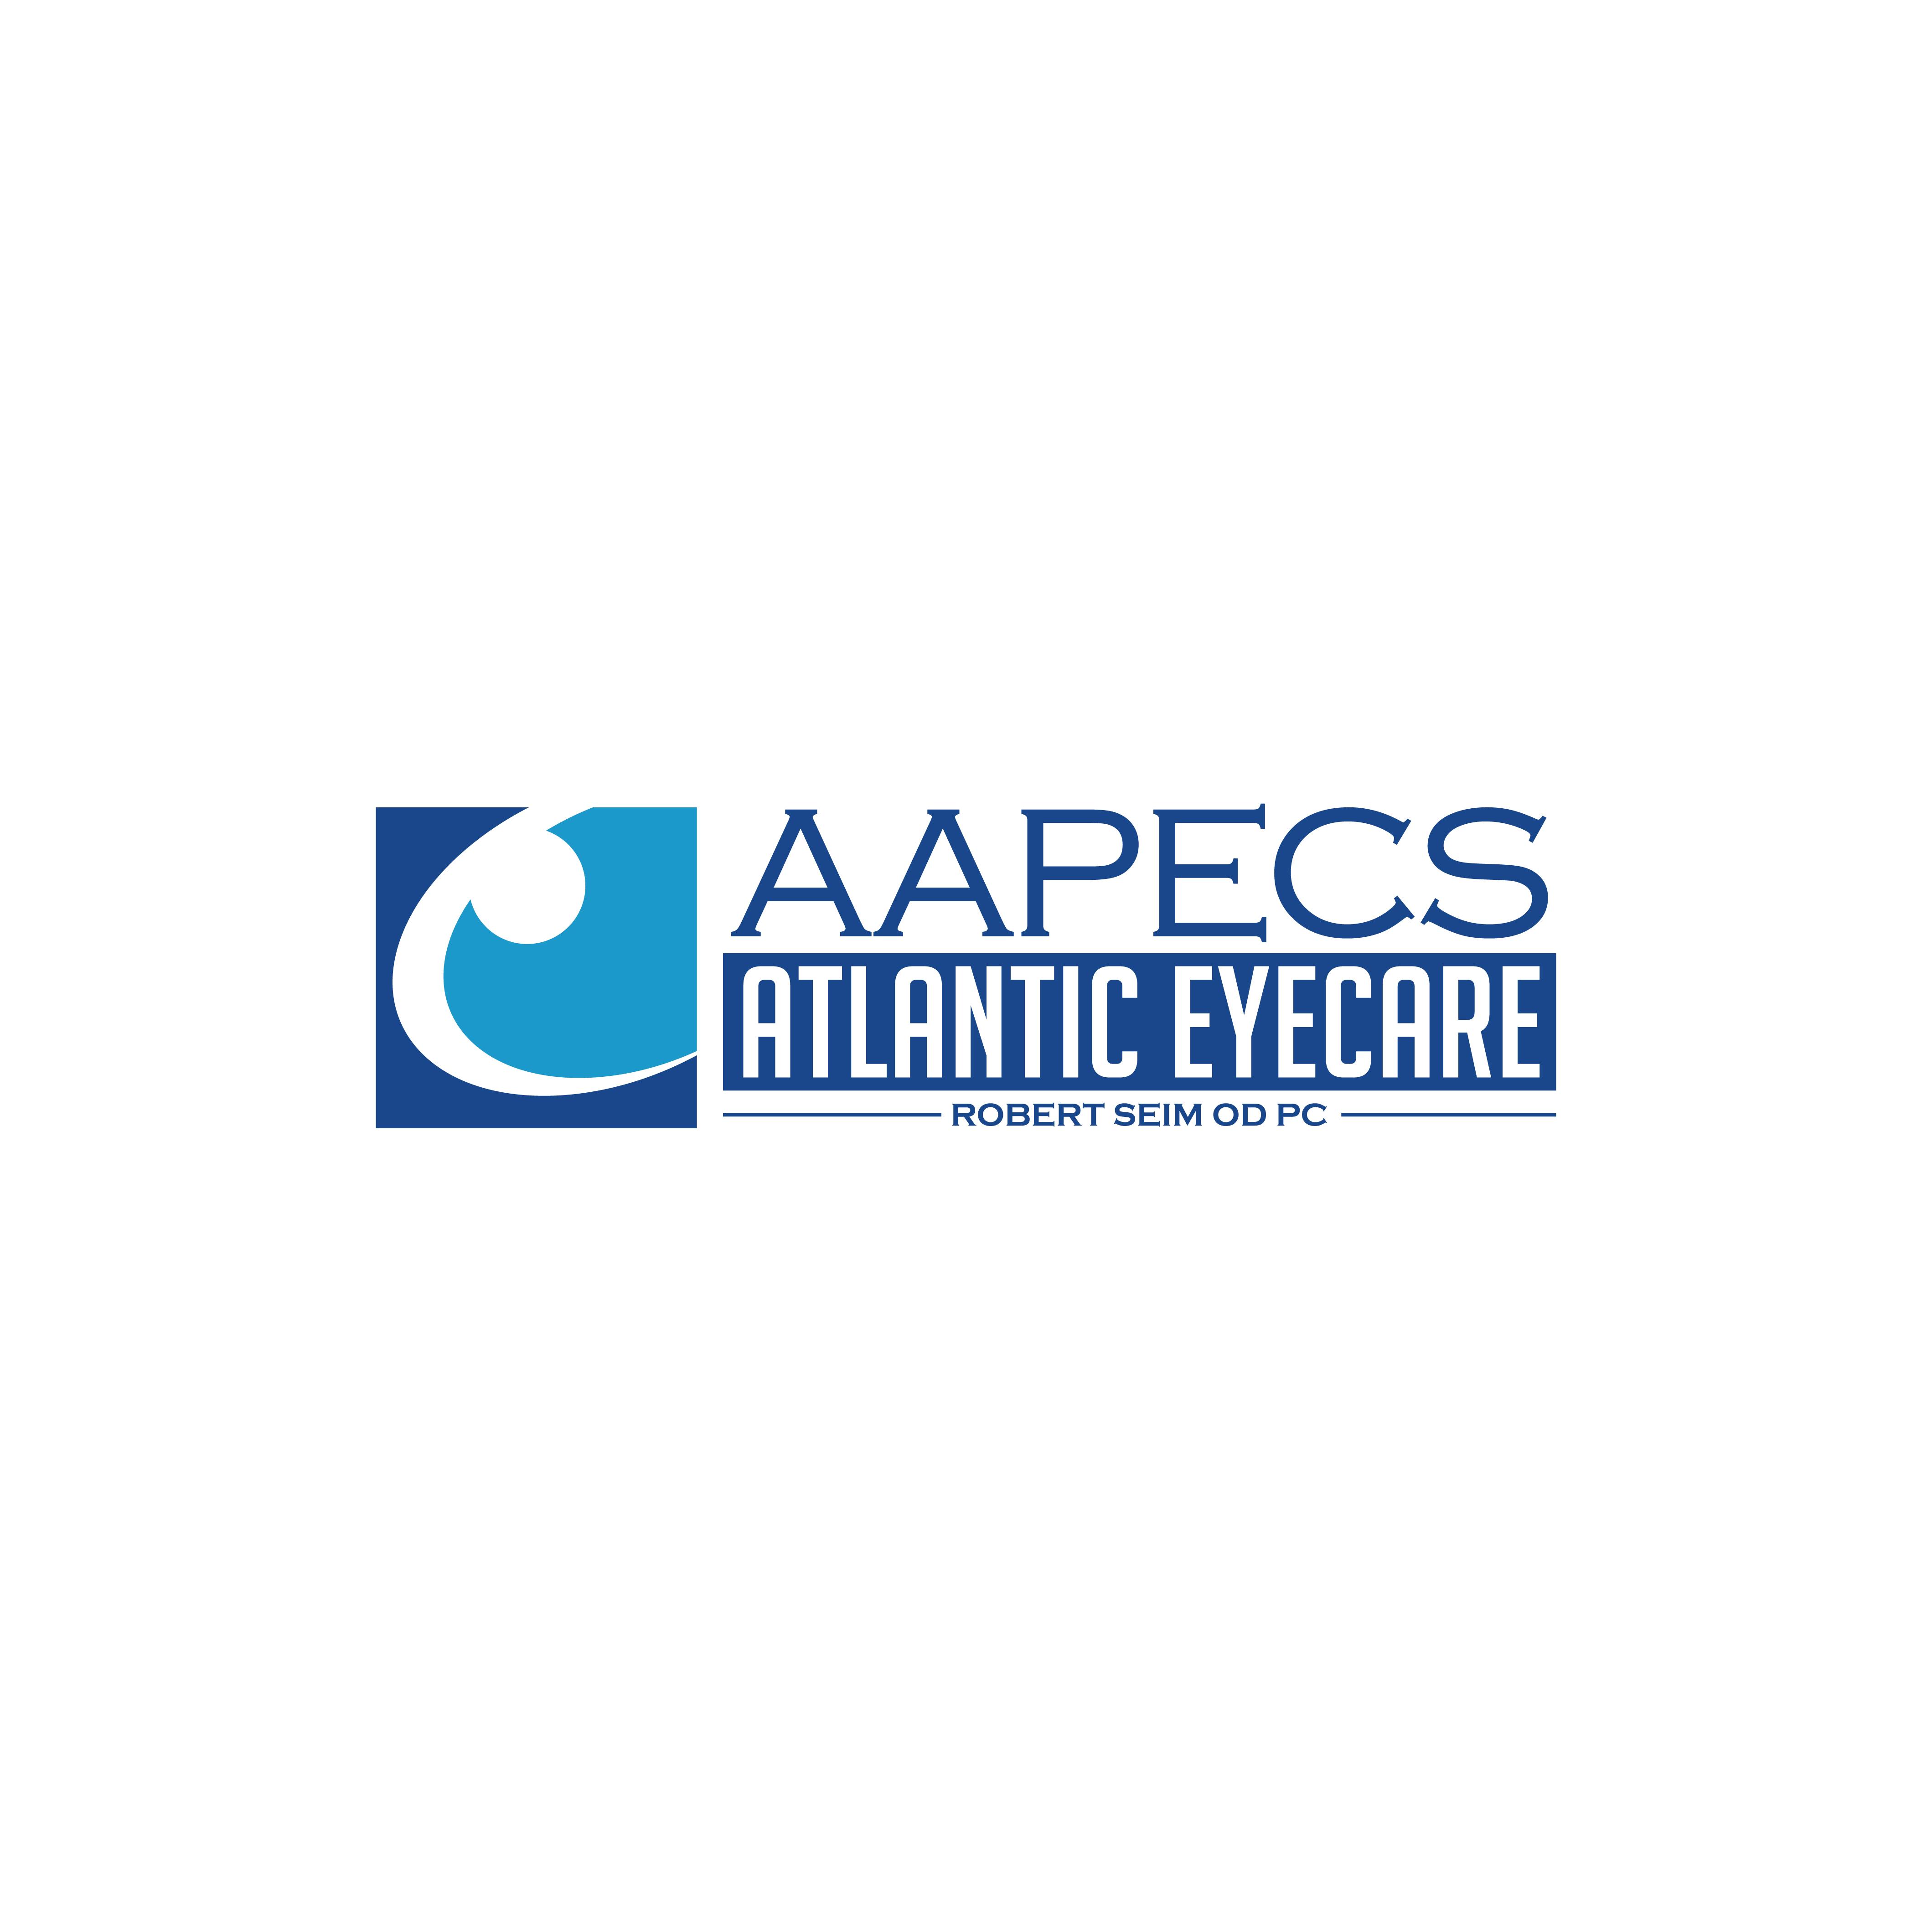 AAPECS Atlantic EyeCare